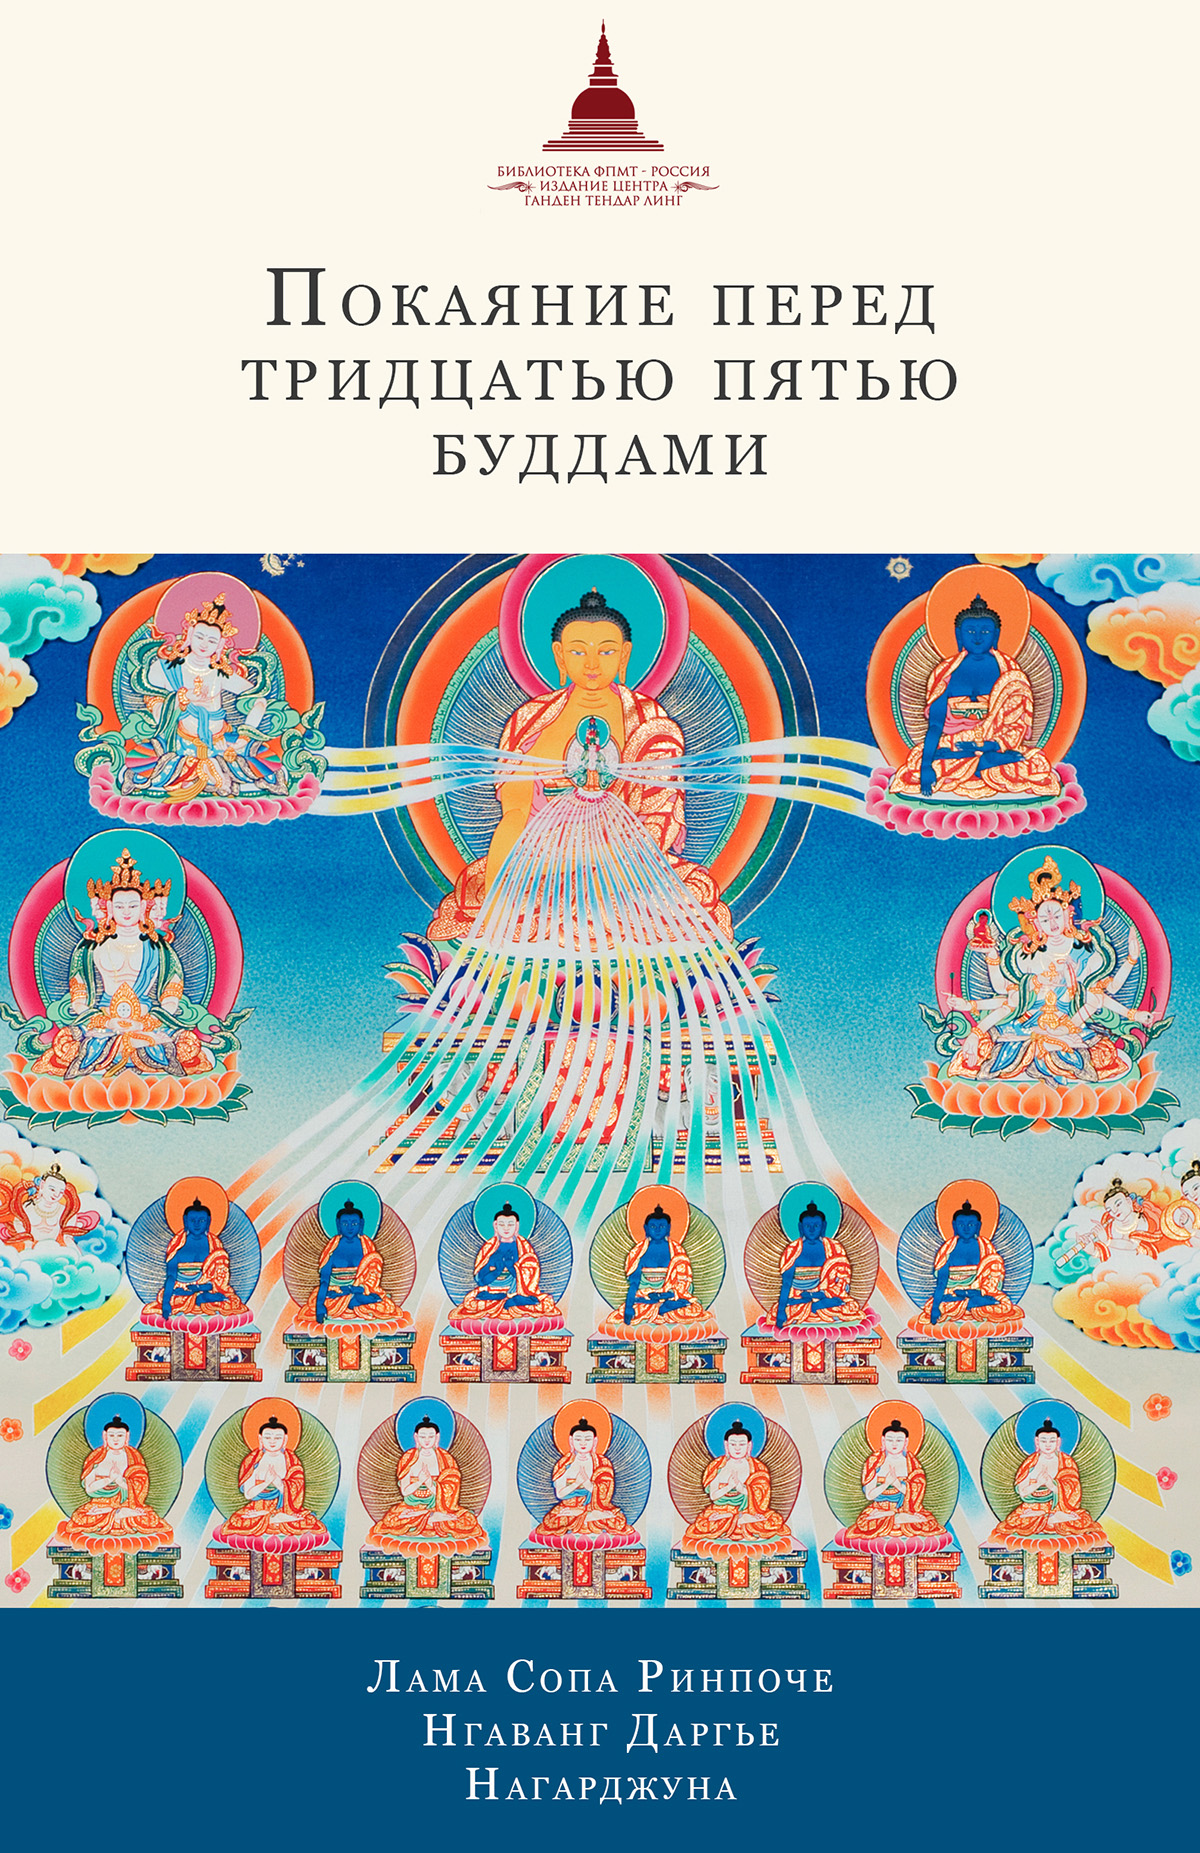 лама Сопа Ринпоче, Нагарджуна, Нгаванг Даргье, С. Куваев «Покаяние перед Тридцатью пятью буддами (сборник)»